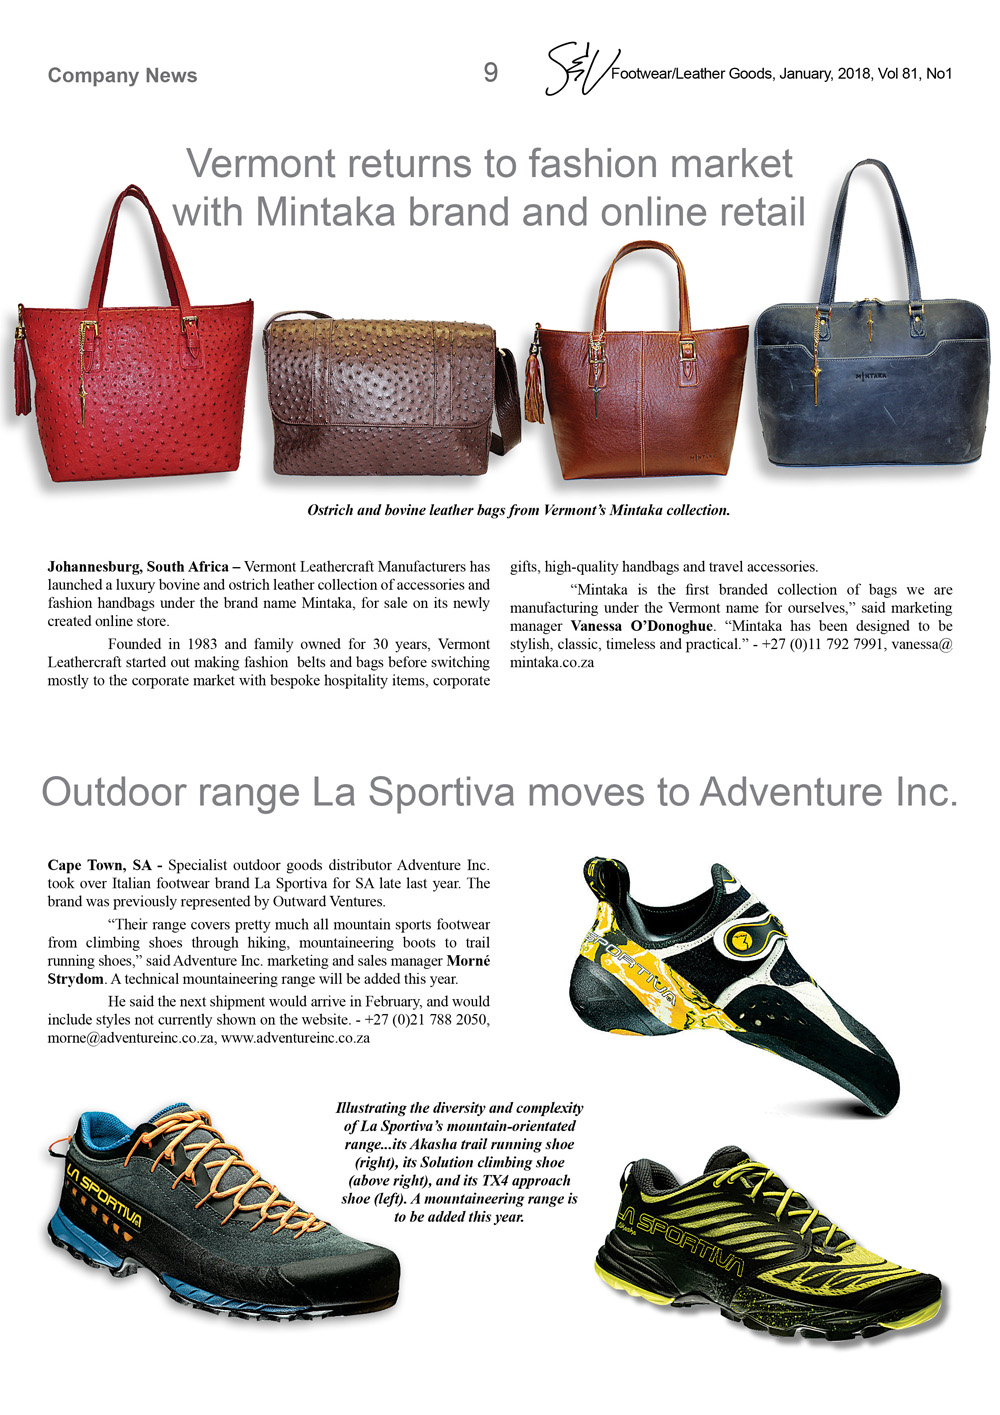 8931cf08938f Footwear   Leather Goods Magazine Vol81 No1 Jan 2018